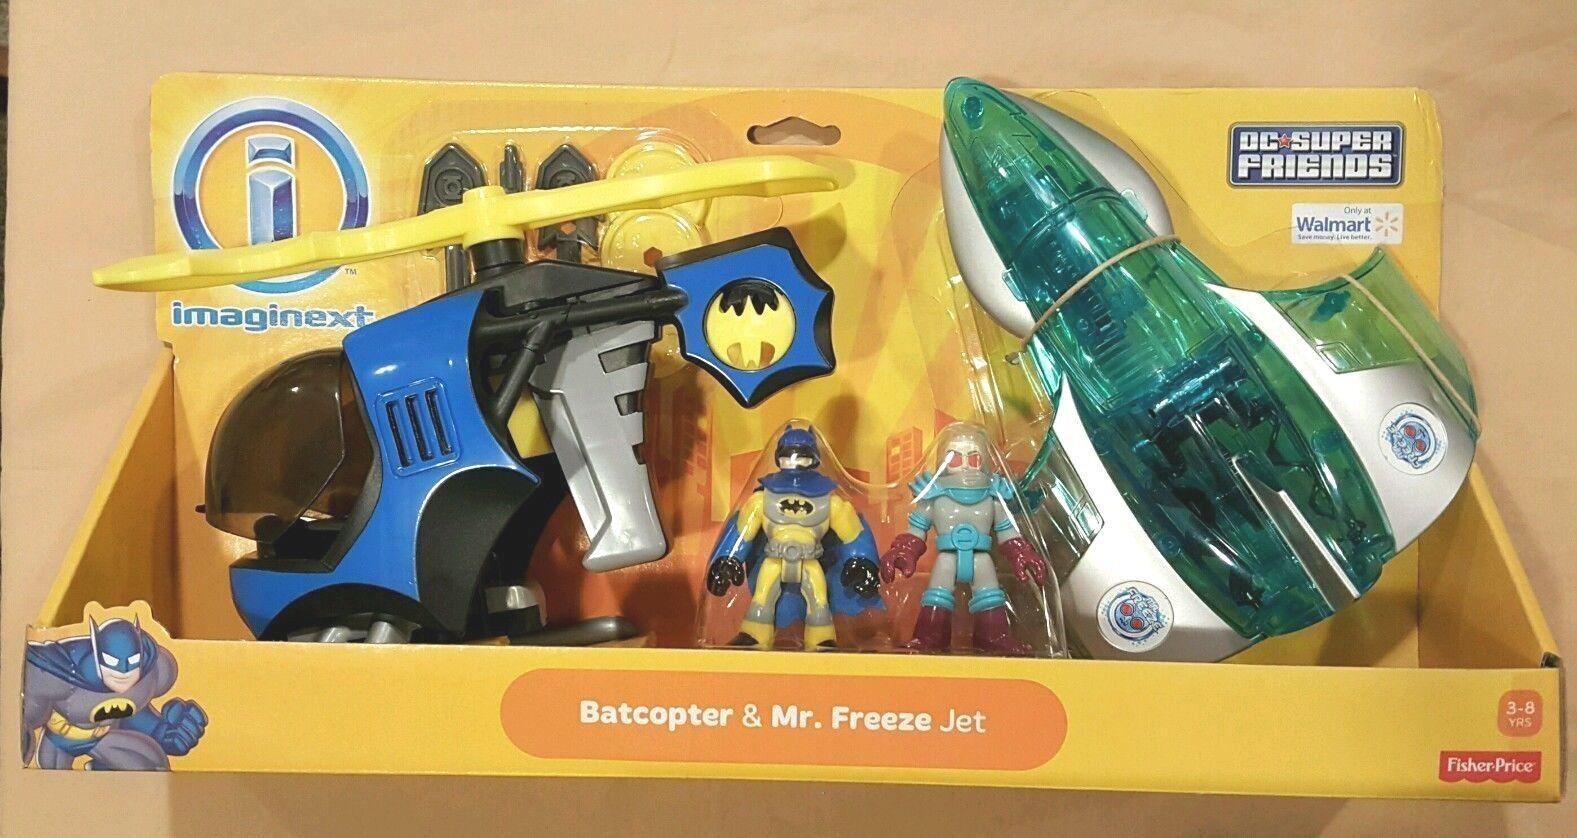 New IMAGINEXT DC Comics SUPER FRIENDS BATMAN BATCOPTER & MR. FREEZE JET Playset